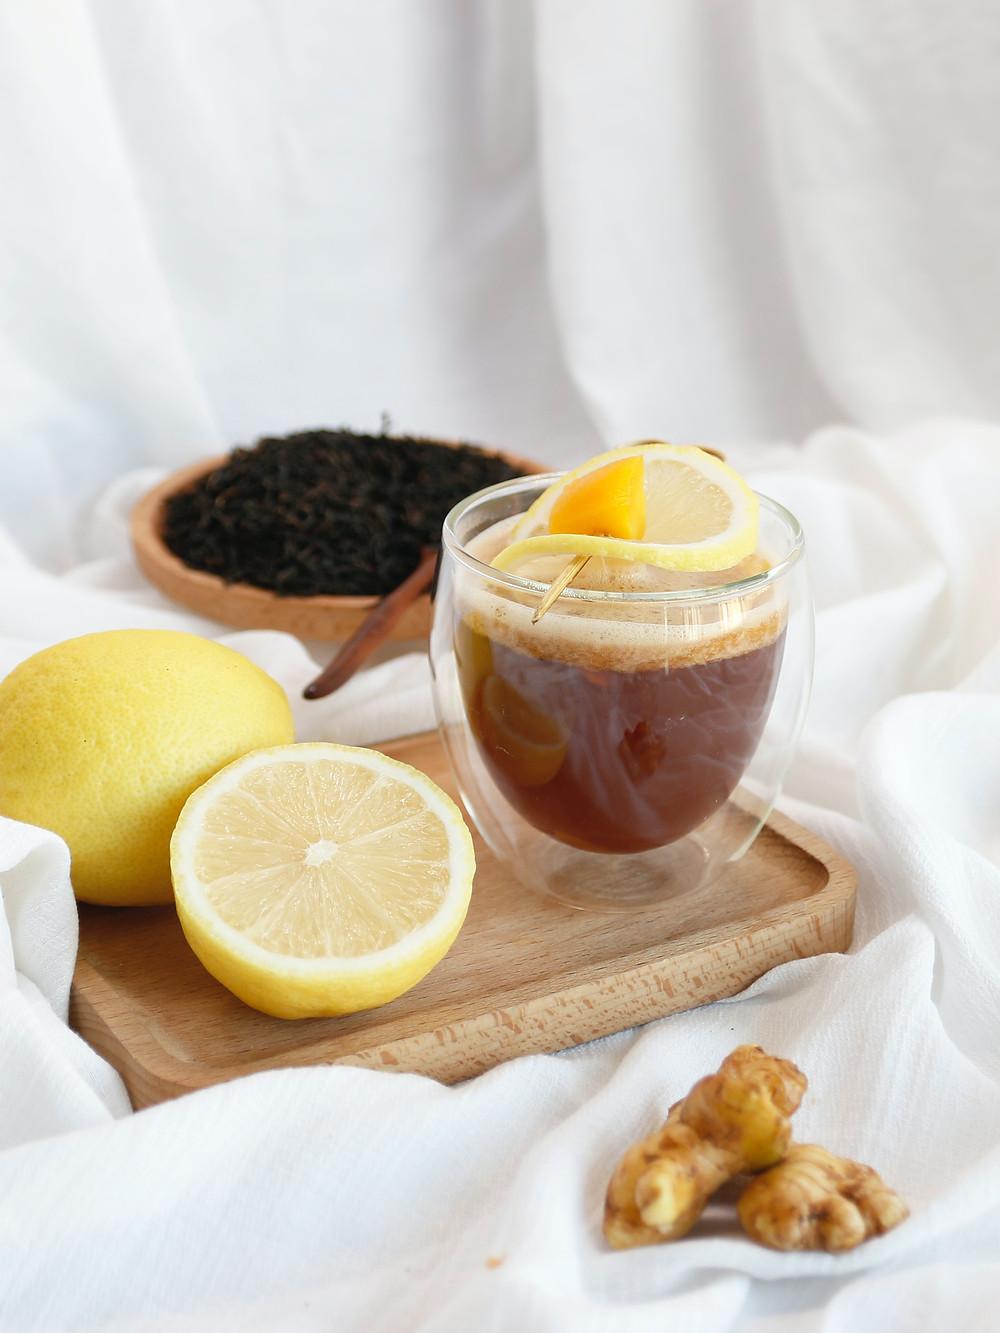 ginger-turmeric green tea